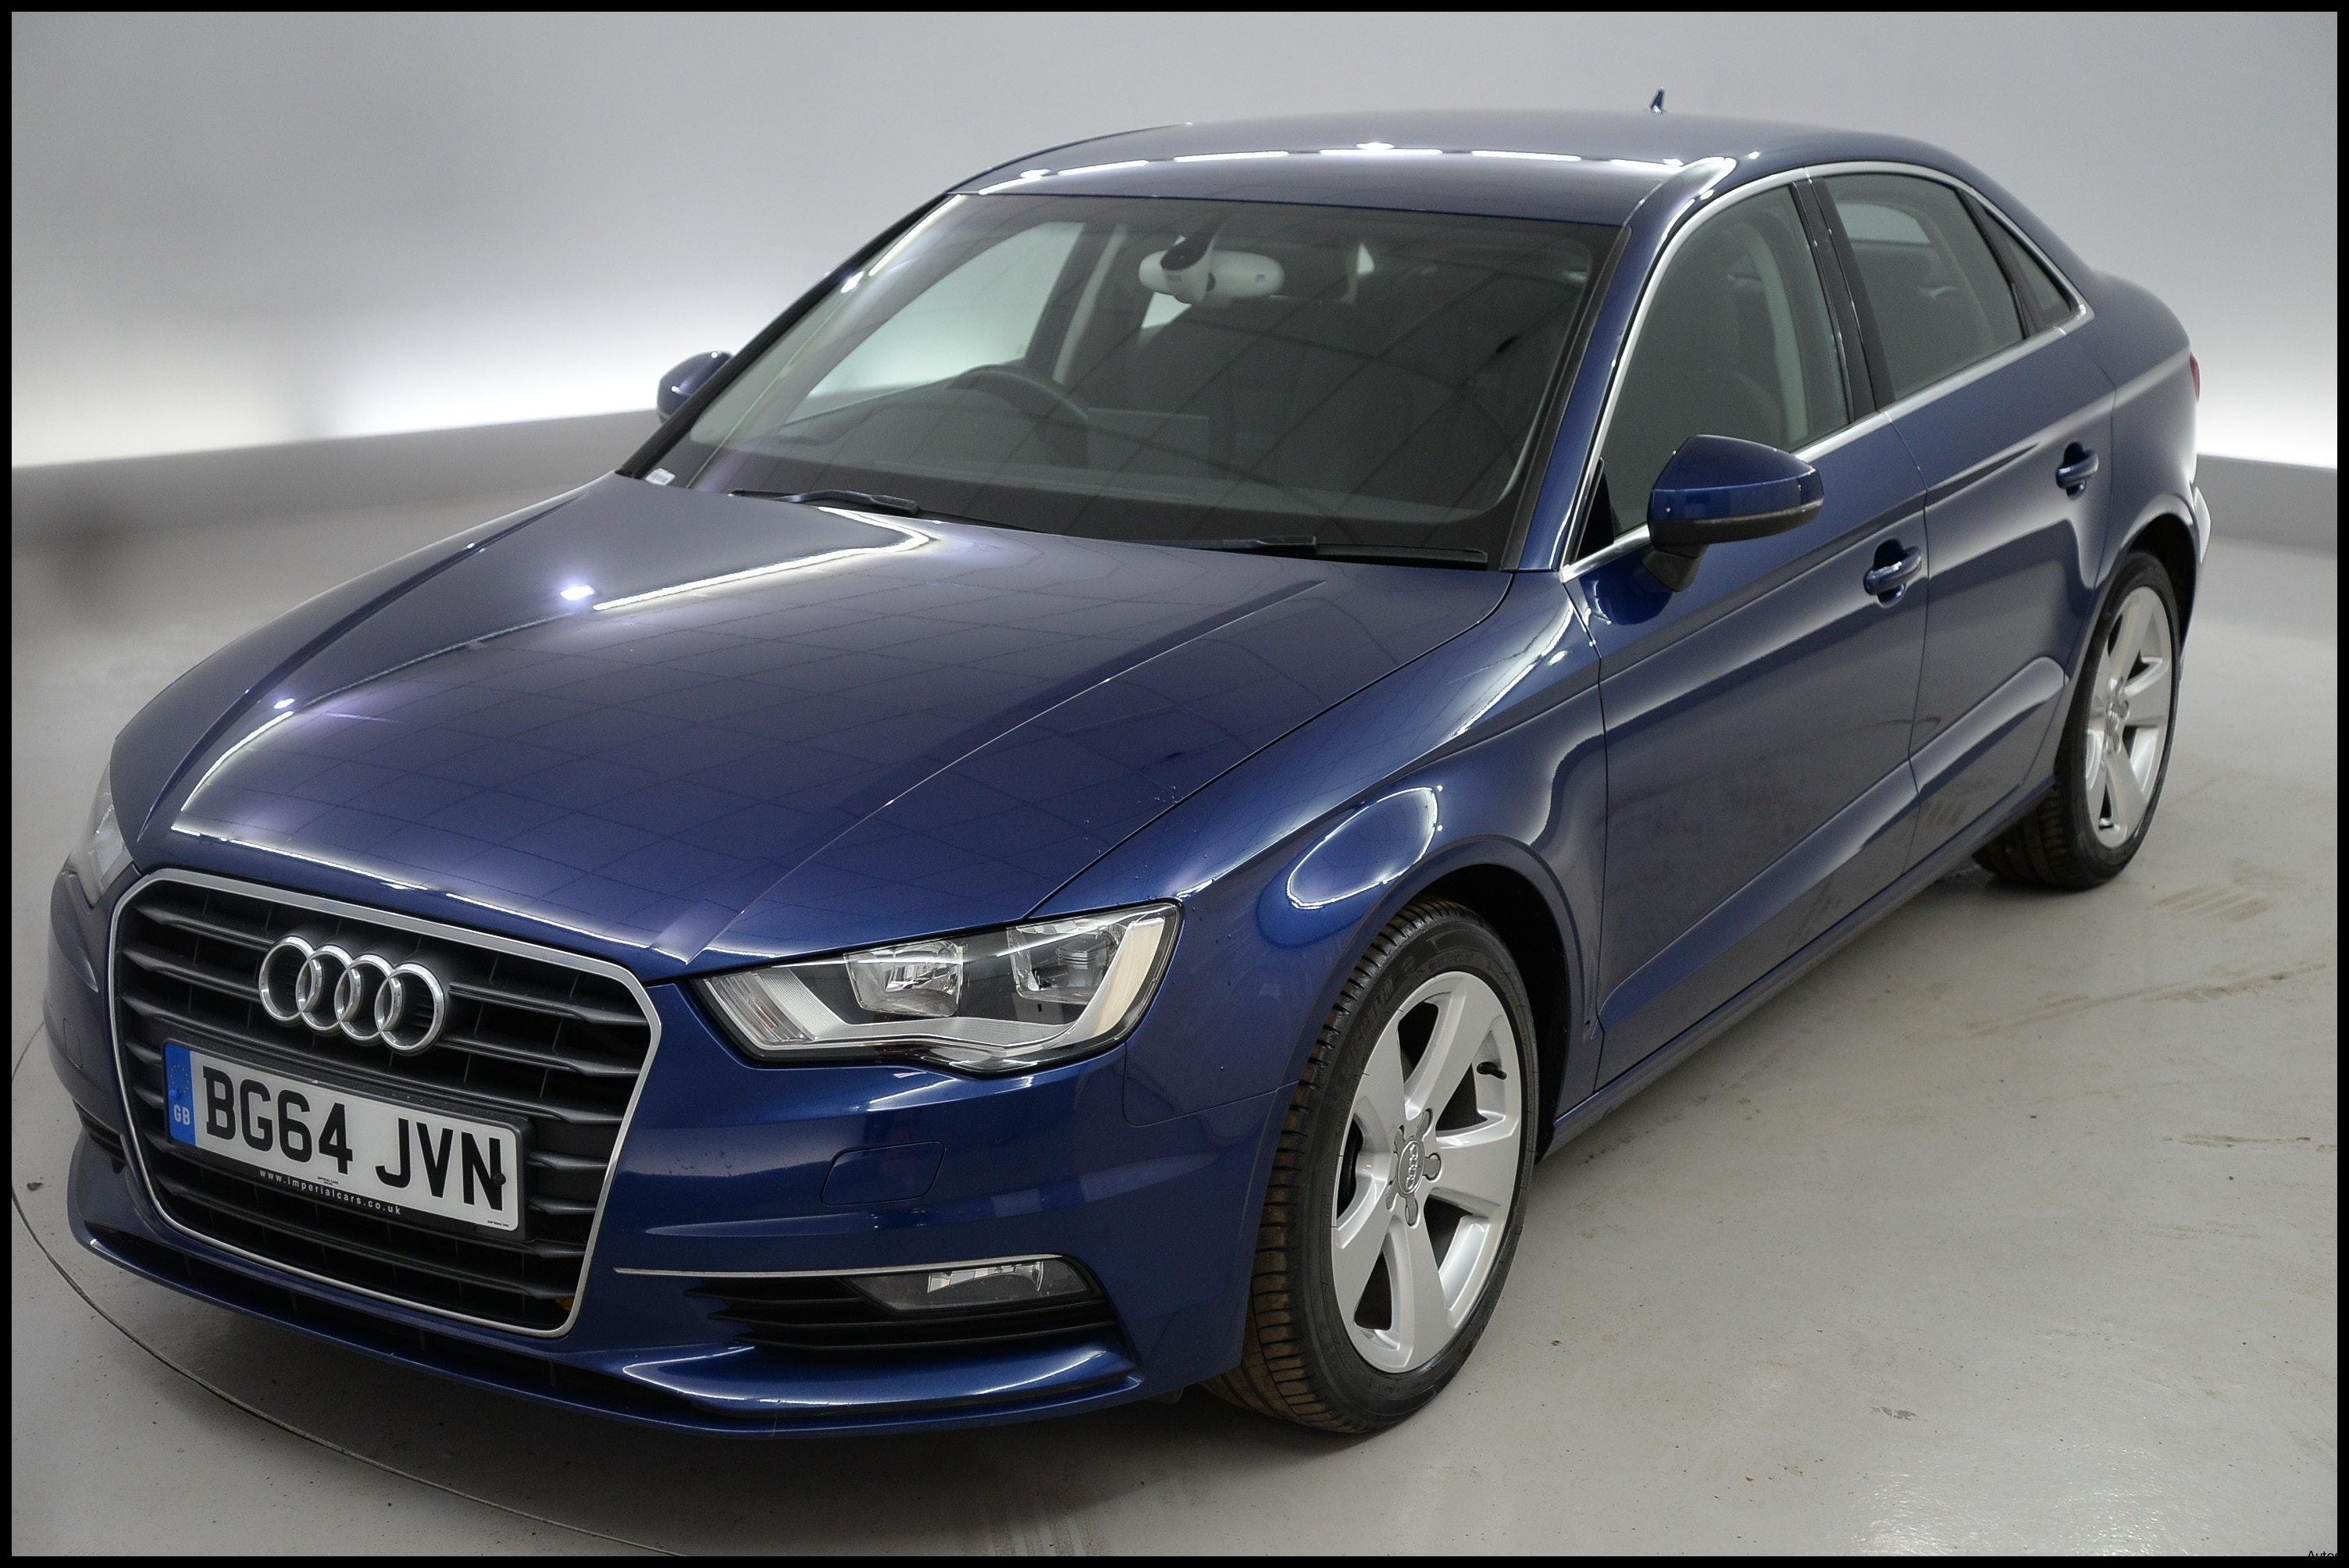 Audi Parent pany Elegant Audi A3 Sedan 2014 1600 0d Auto Side 15 X Convertible Sport